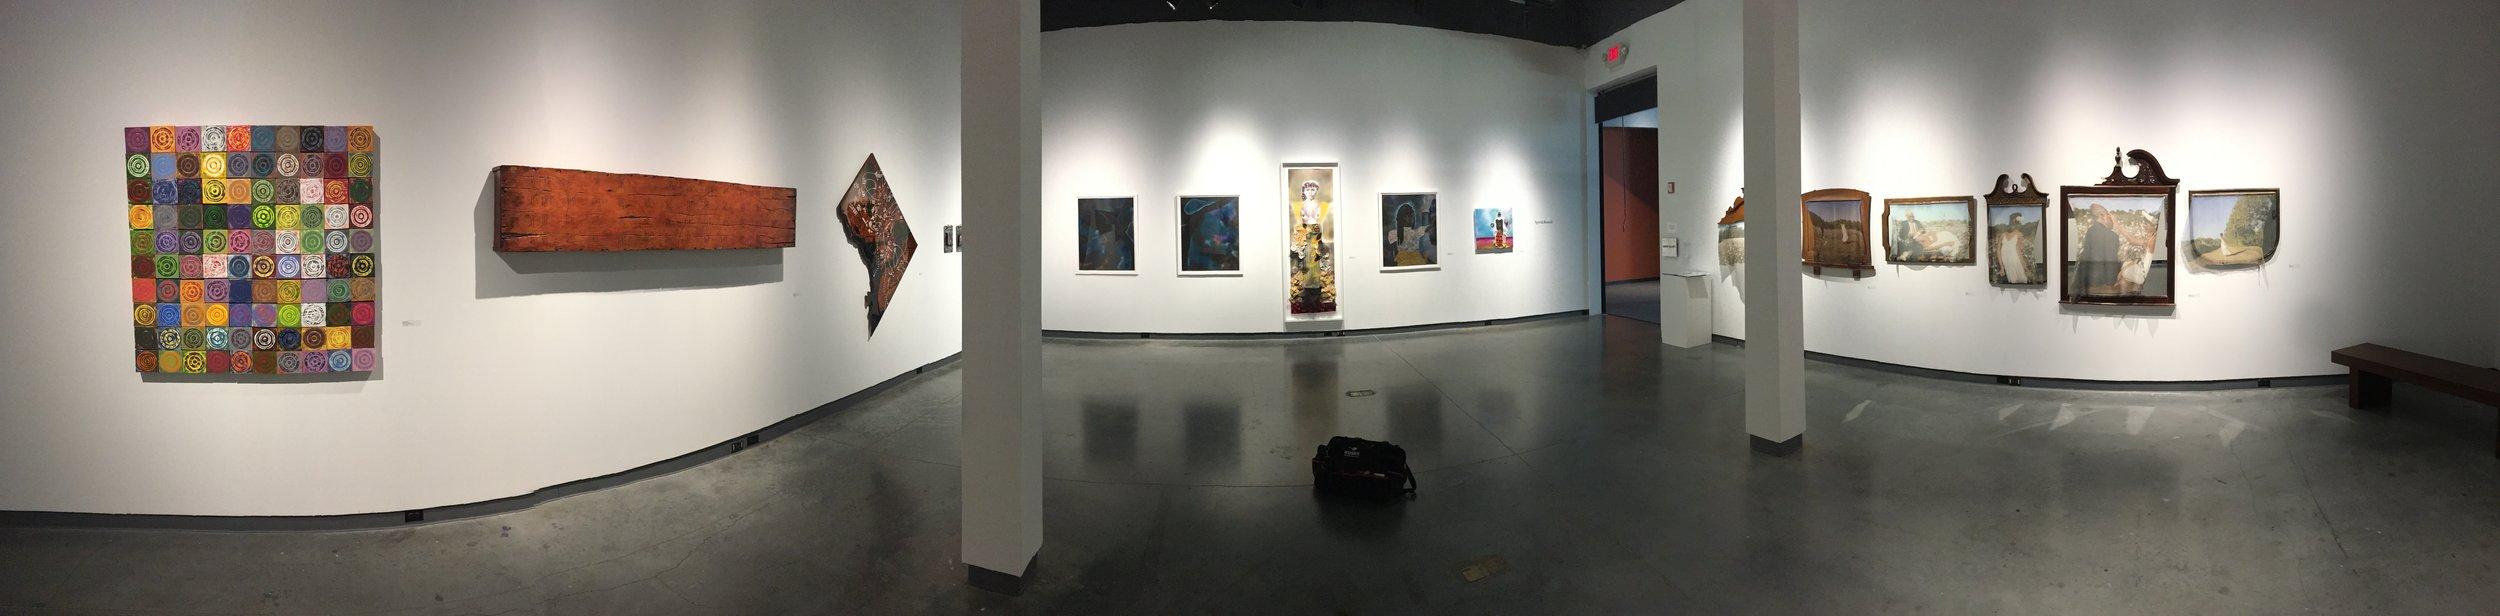 """Spiral, Recoil"" @ The Delaware Contemporary, Wilmington, DE - 2017"